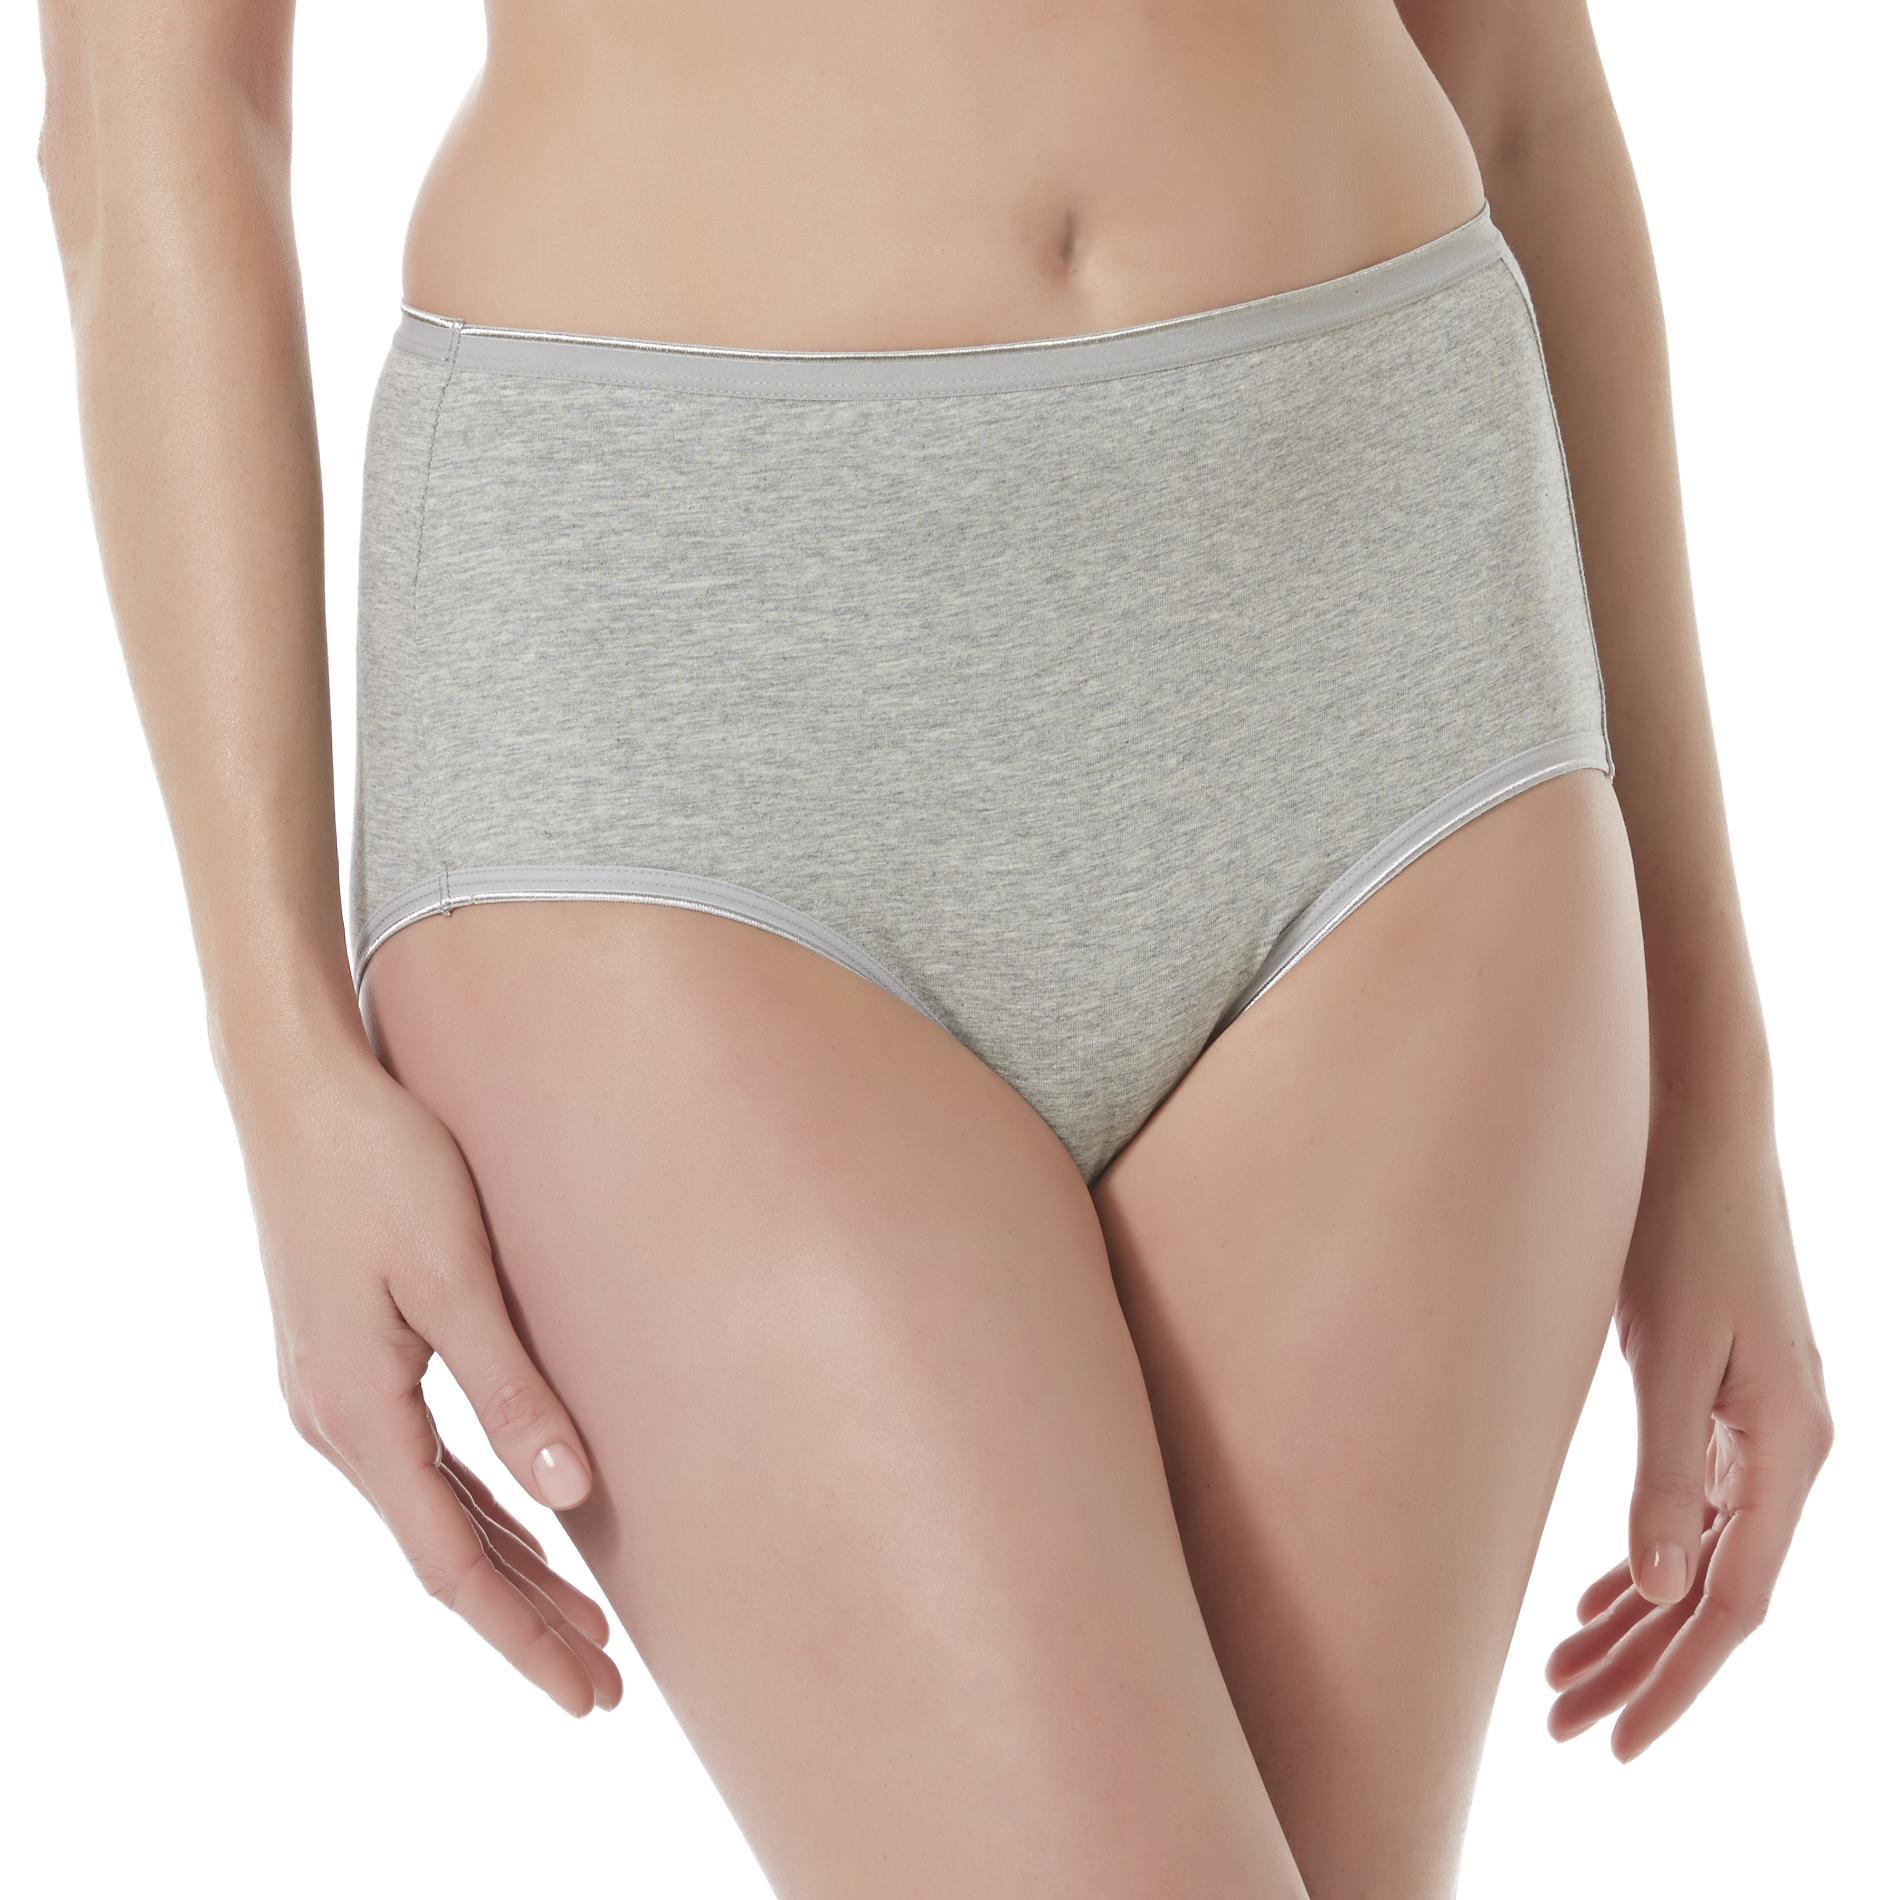 Women's Brief Panties - Heathered